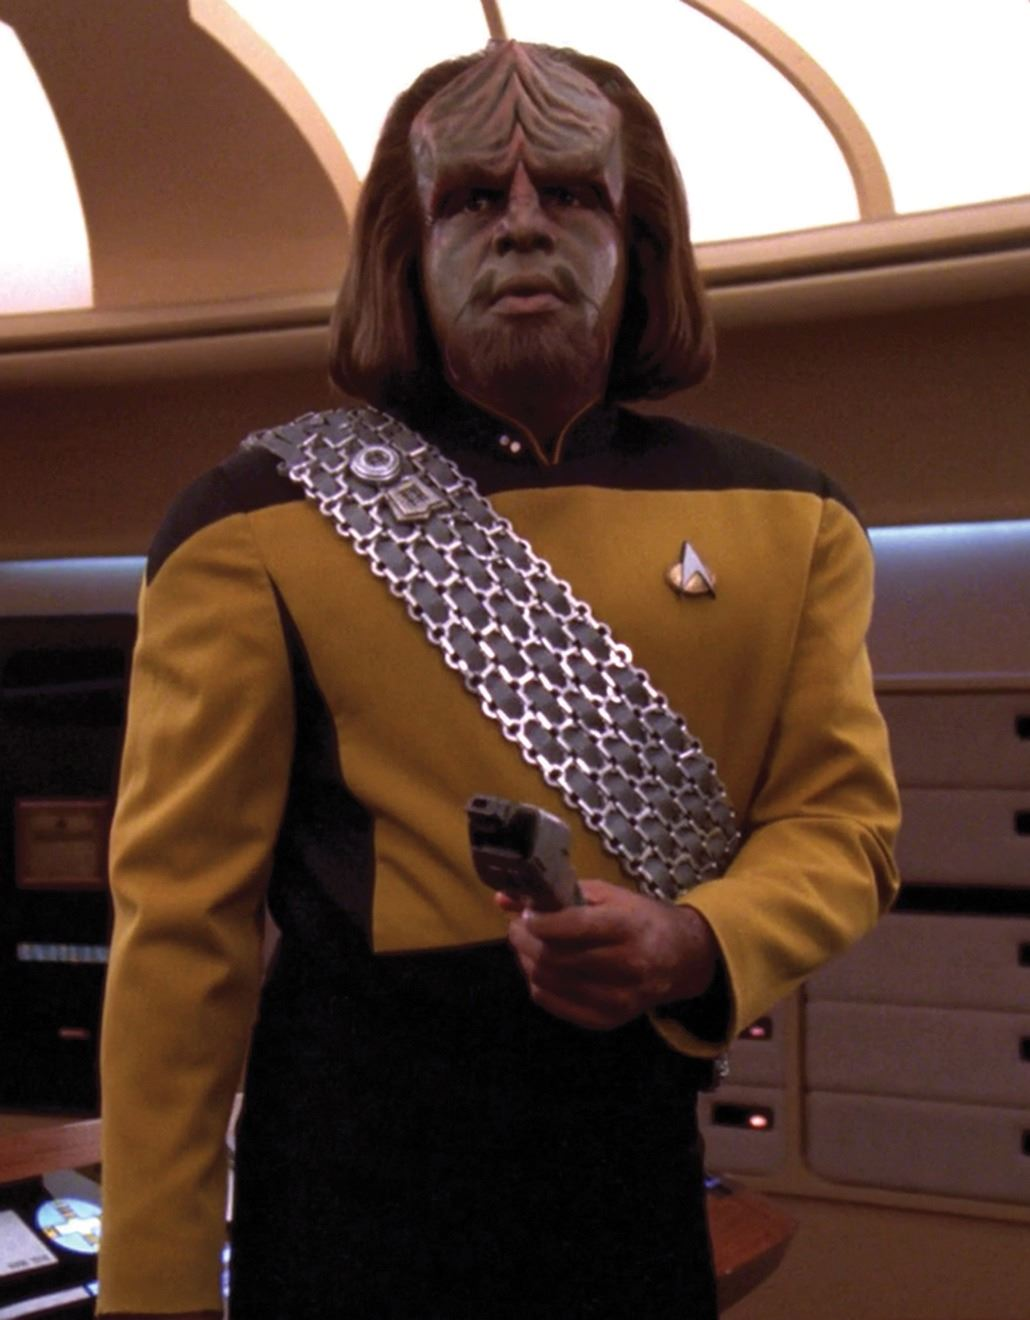 Star Trek The Original Series Rewatch: The Paradise